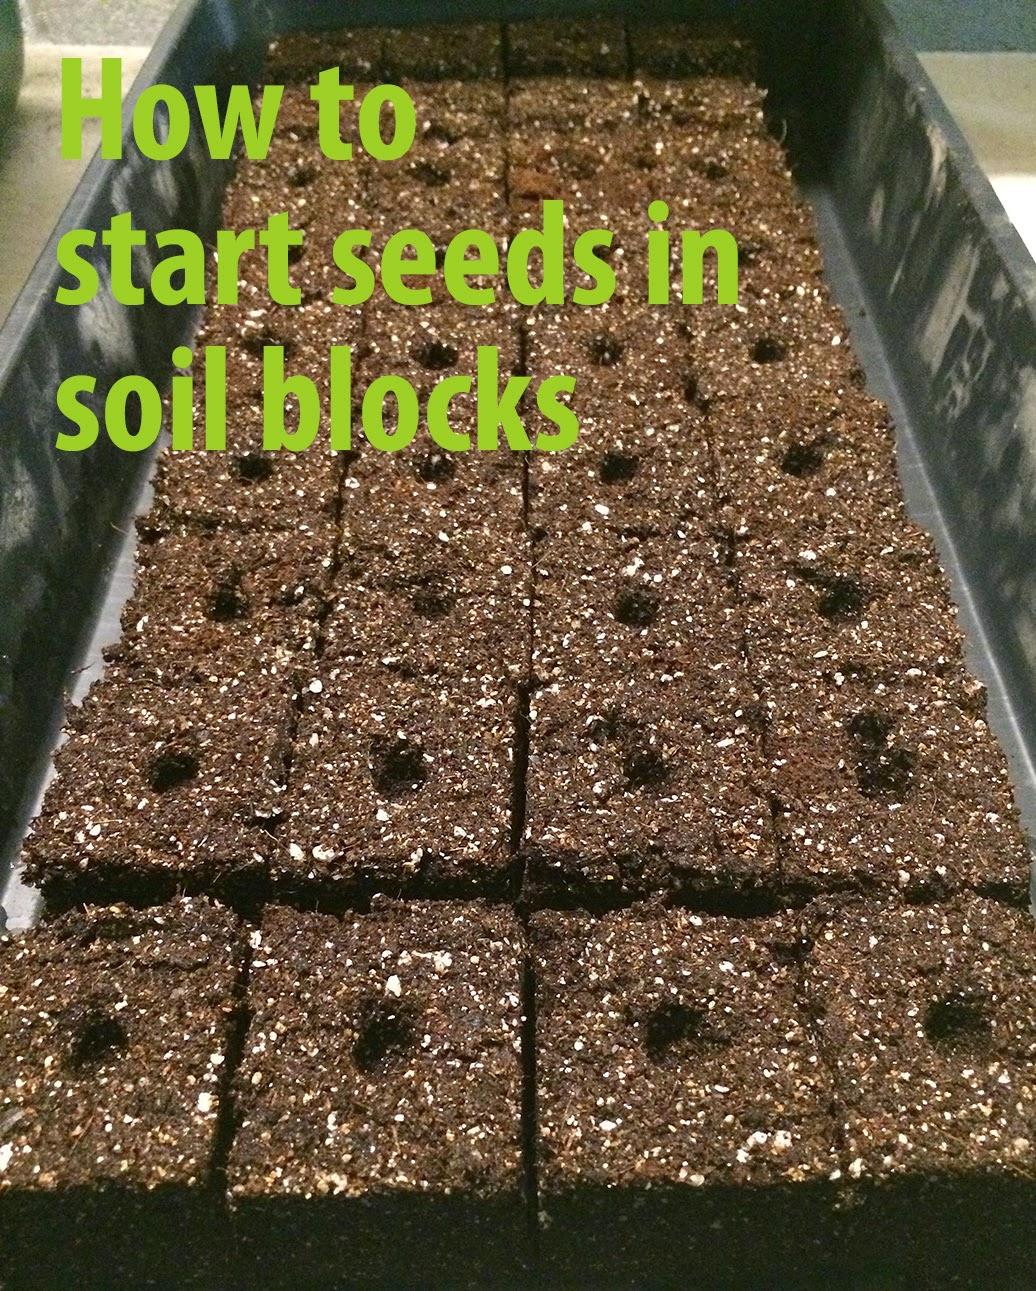 soil block Archives | The Impatient Gardener